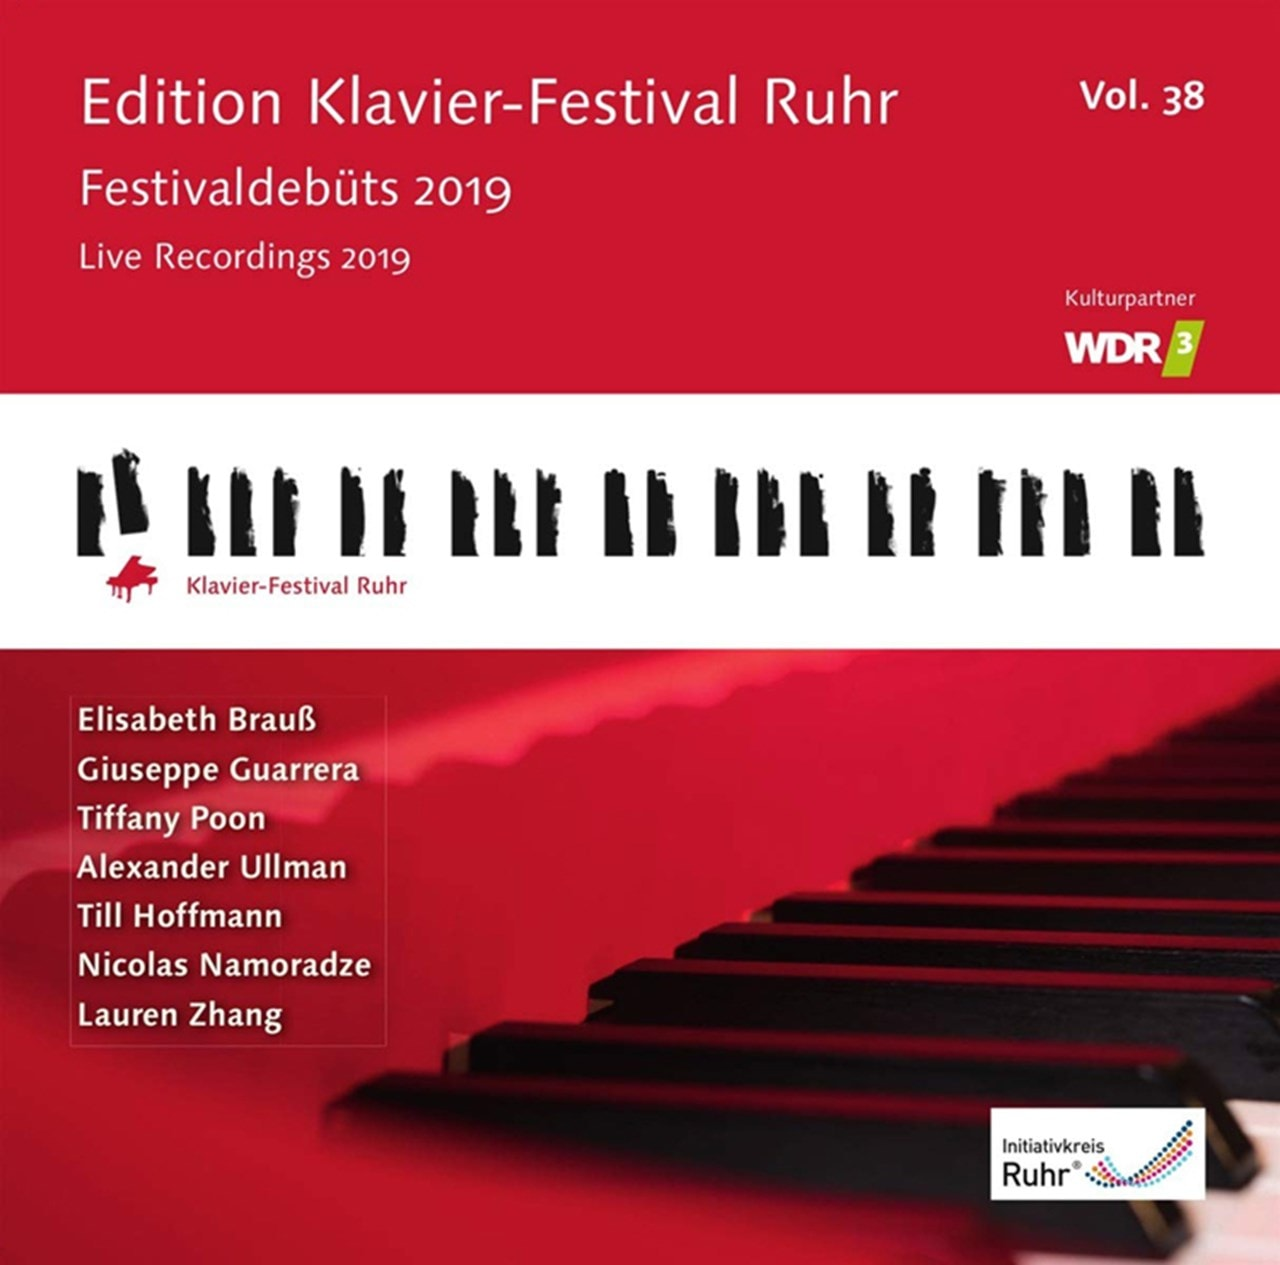 Edition Klavier-Festival Ruhr: Festivaldebuts 2019 - Volume 38 - 1